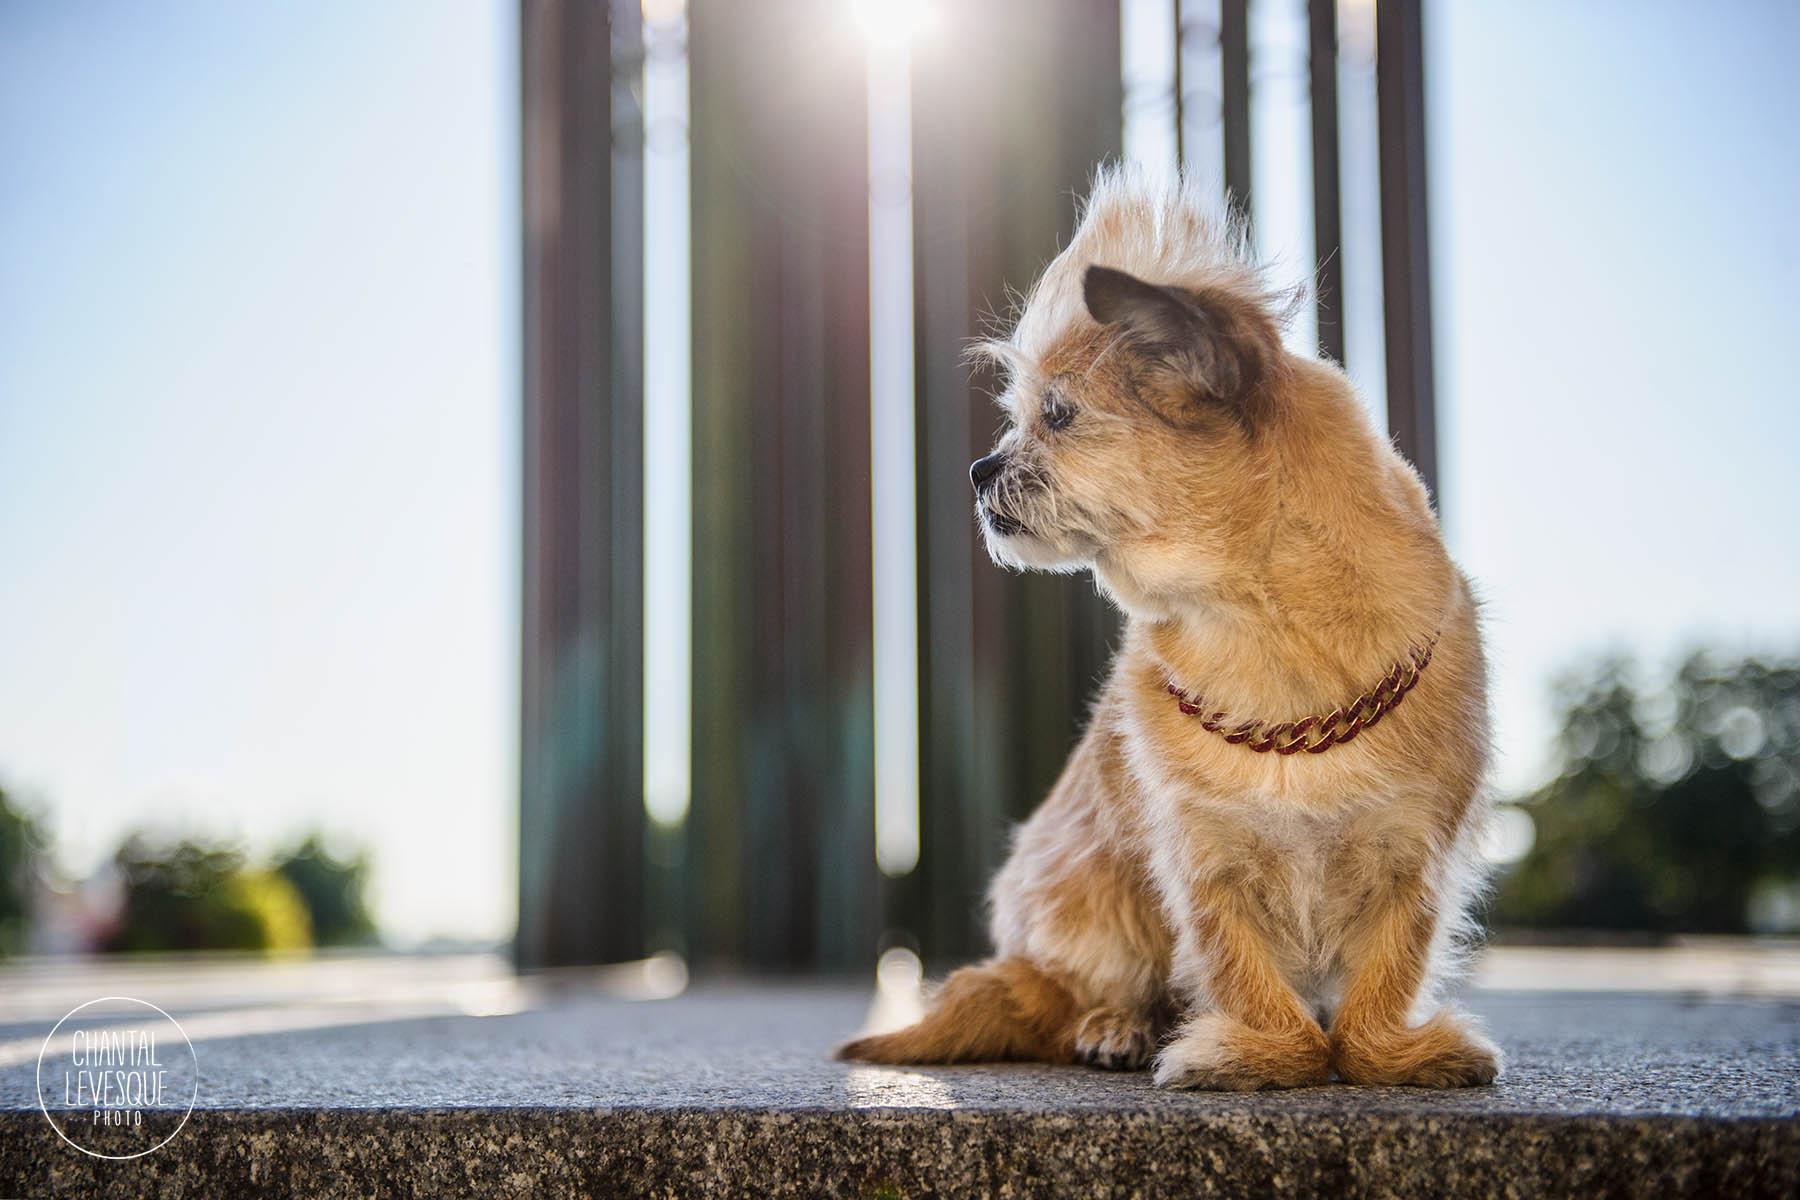 rescue-puppy-fashion-photo-montreal.jpg